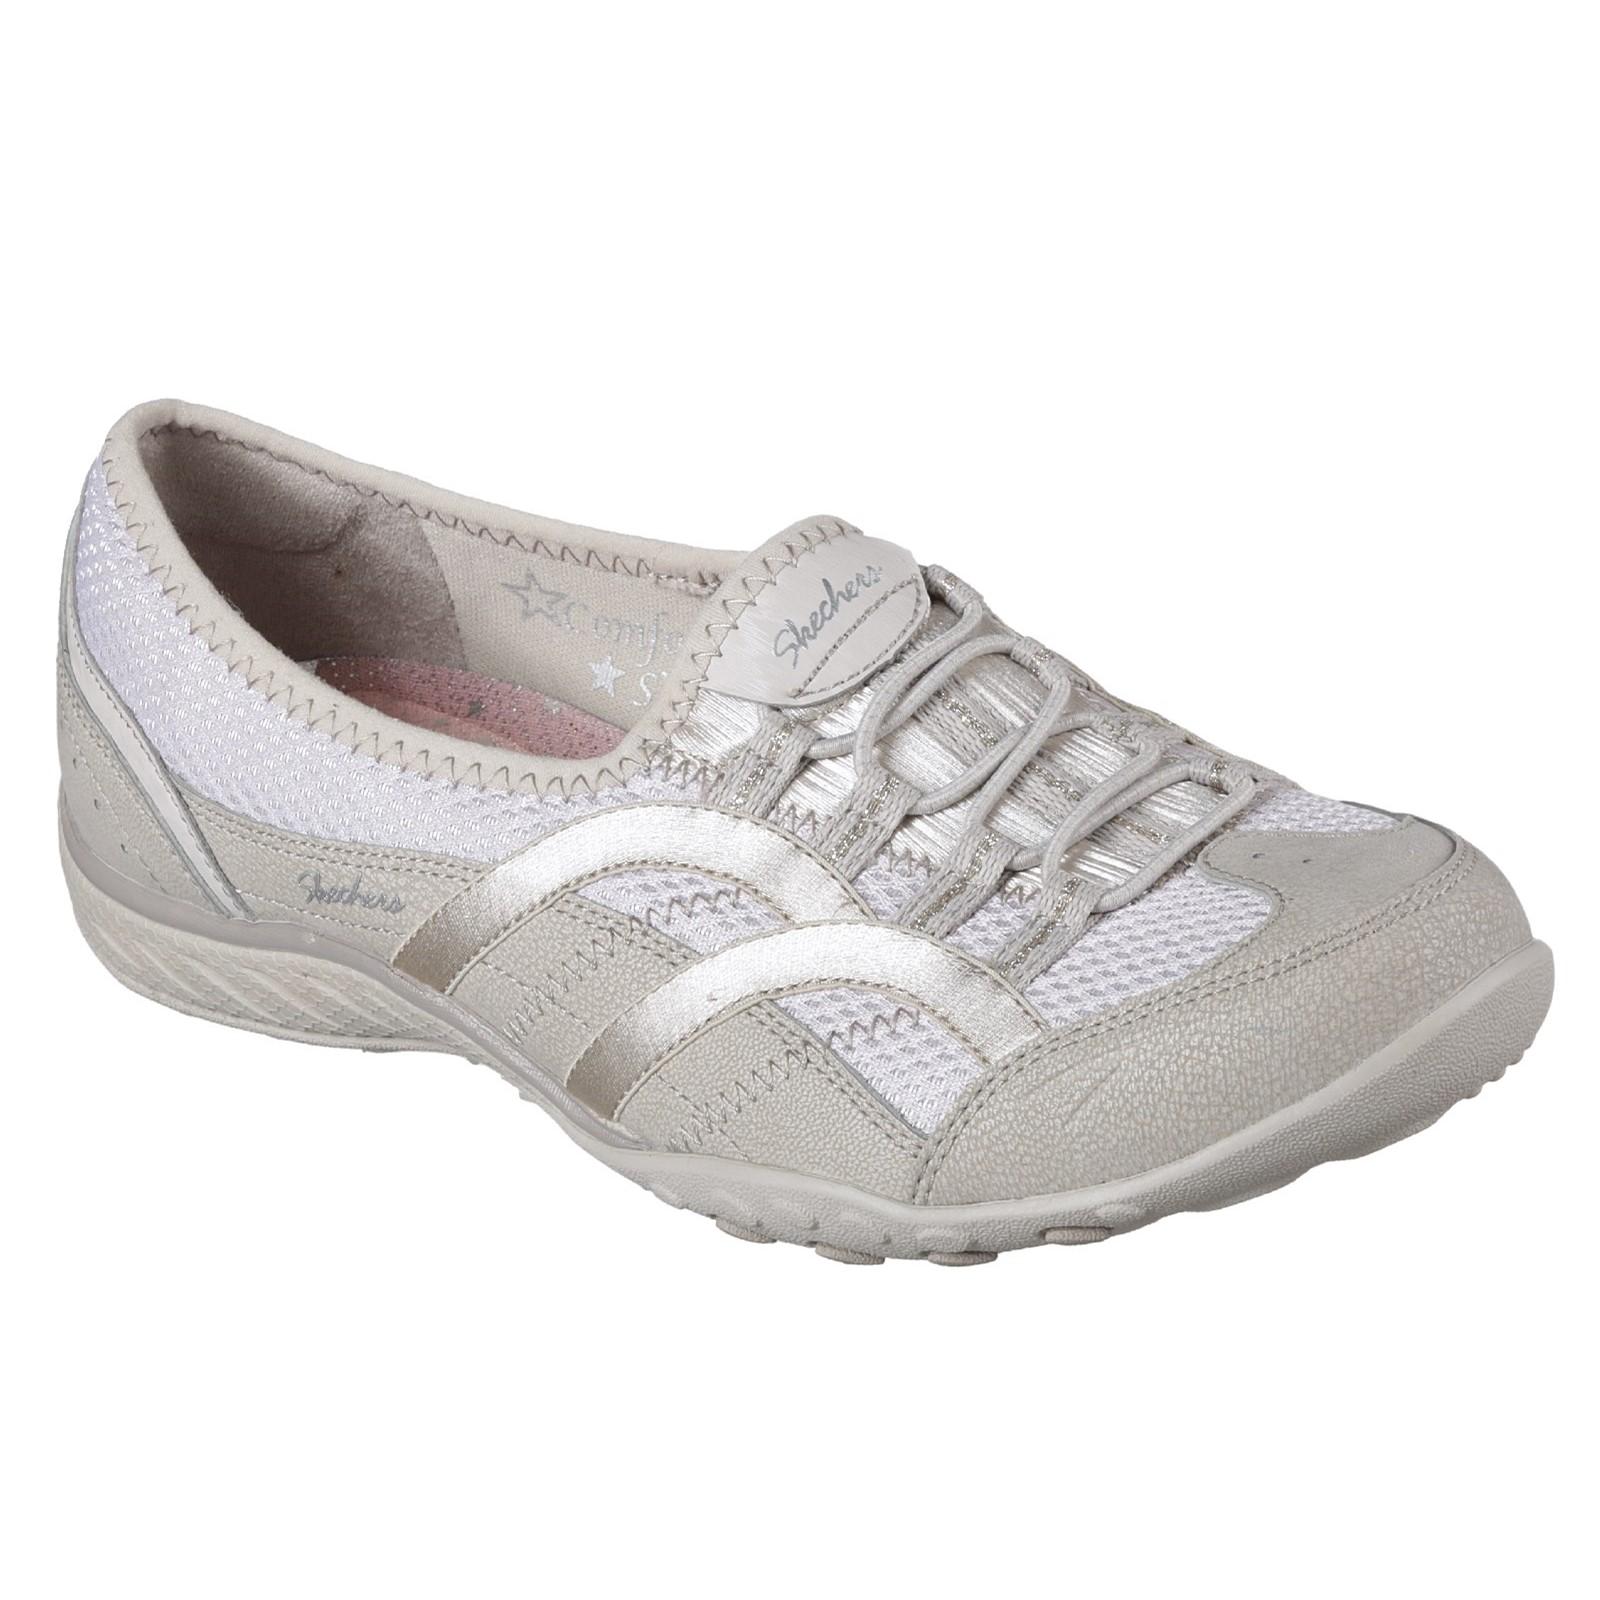 Skechers Womens Breathe Easy Well Versed shoes